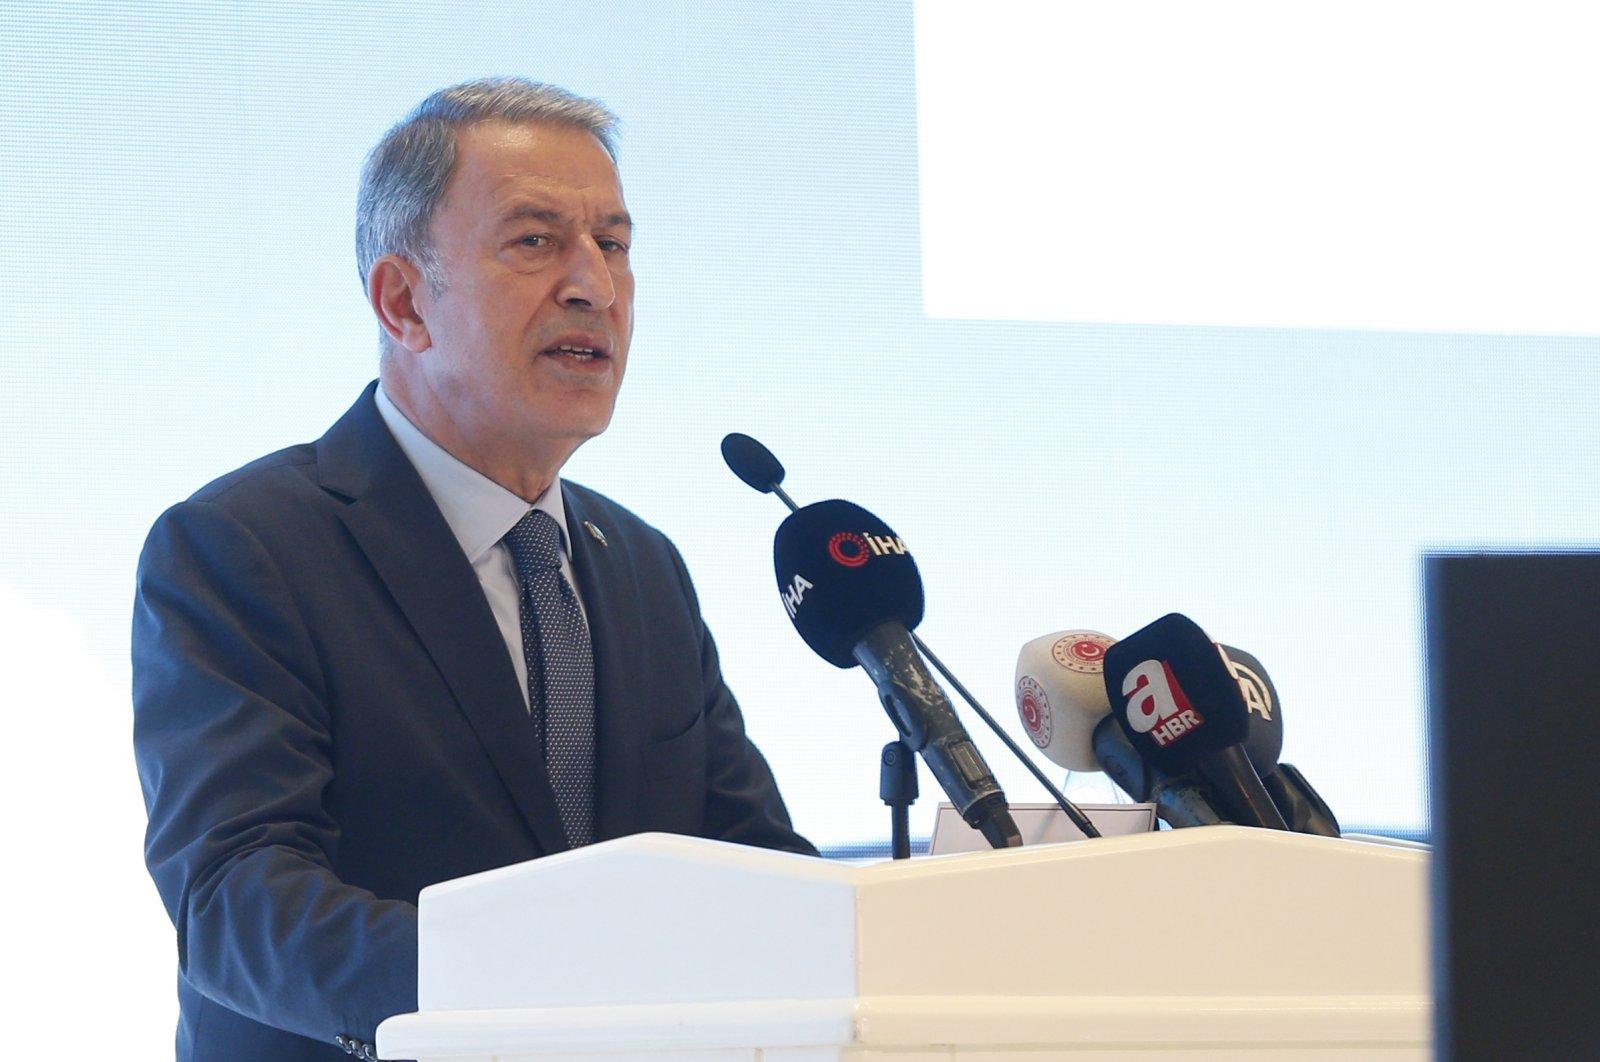 Defense Minister Hulusi Akar speaks at the opening of a plane maintenance facility, Kayseri, Turkey, July 8, 2021. (AA Photo)